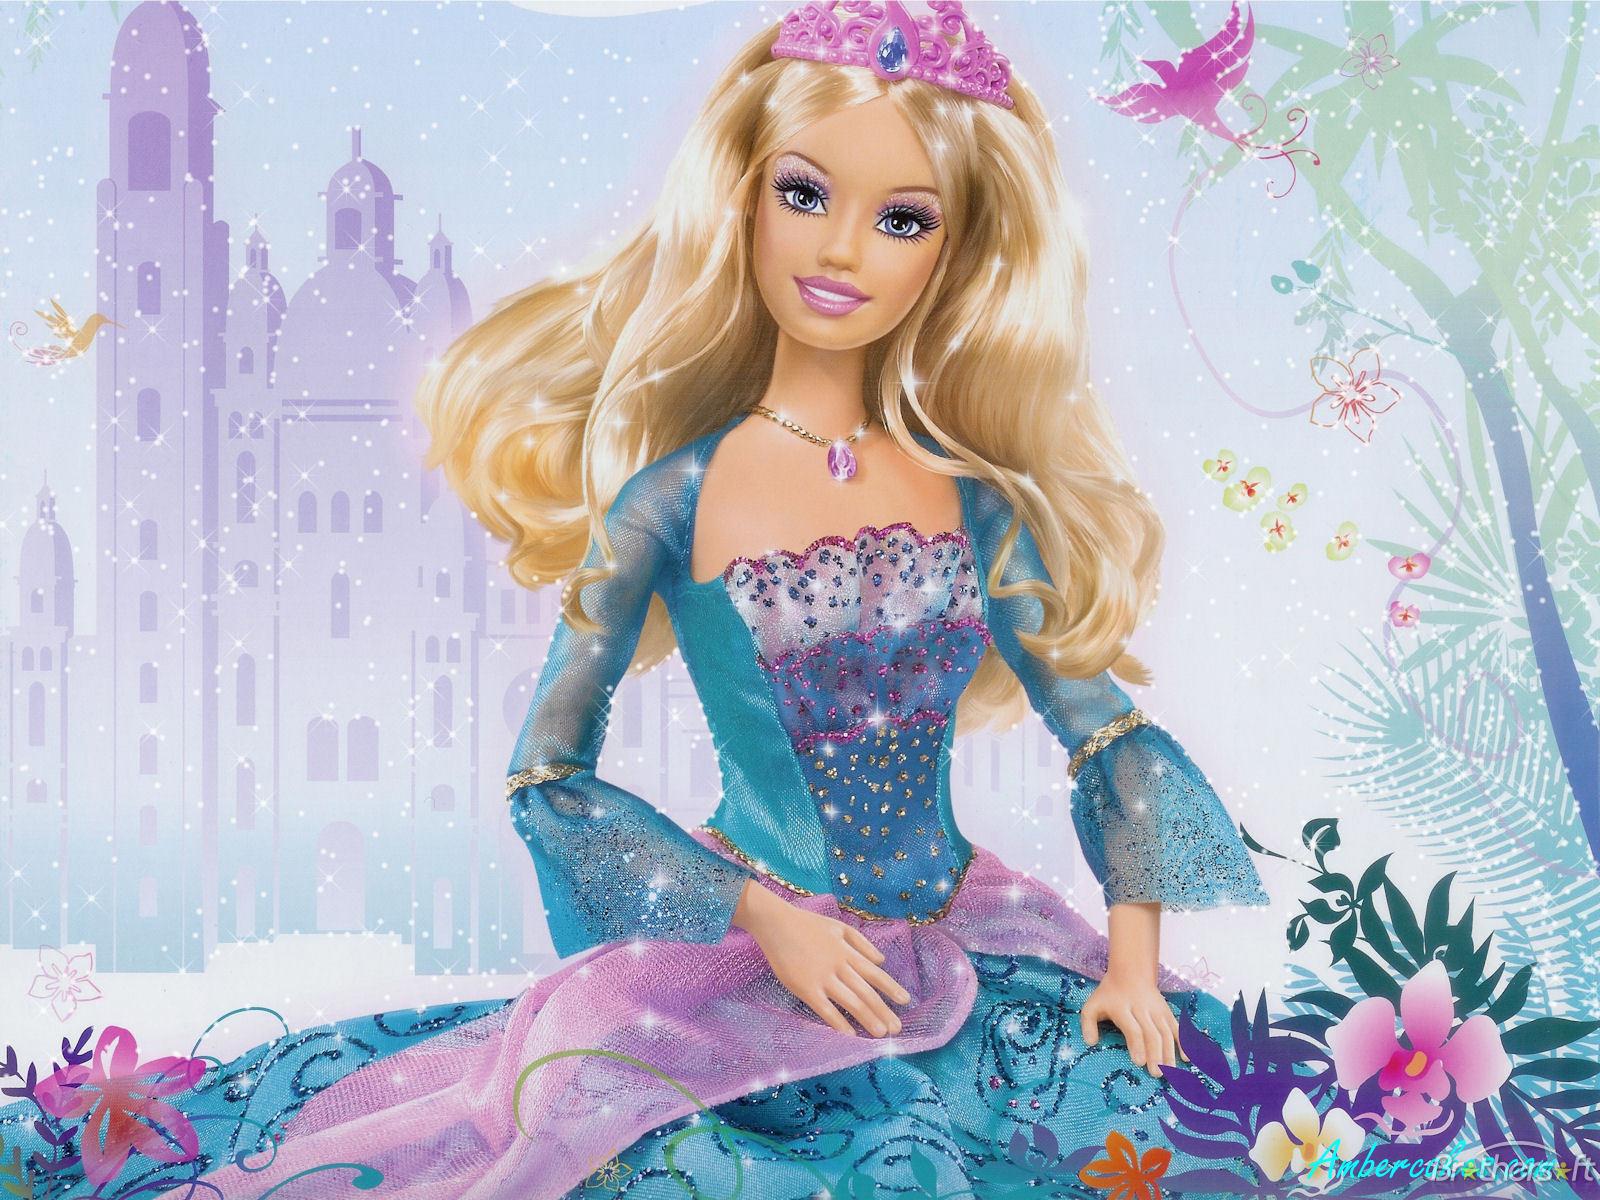 http://2.bp.blogspot.com/-p-KSZDQN75w/ThlOITecgEI/AAAAAAAAF9g/sXpqHlADenA/s1600/barbie-wallpapers-hd-1.jpg